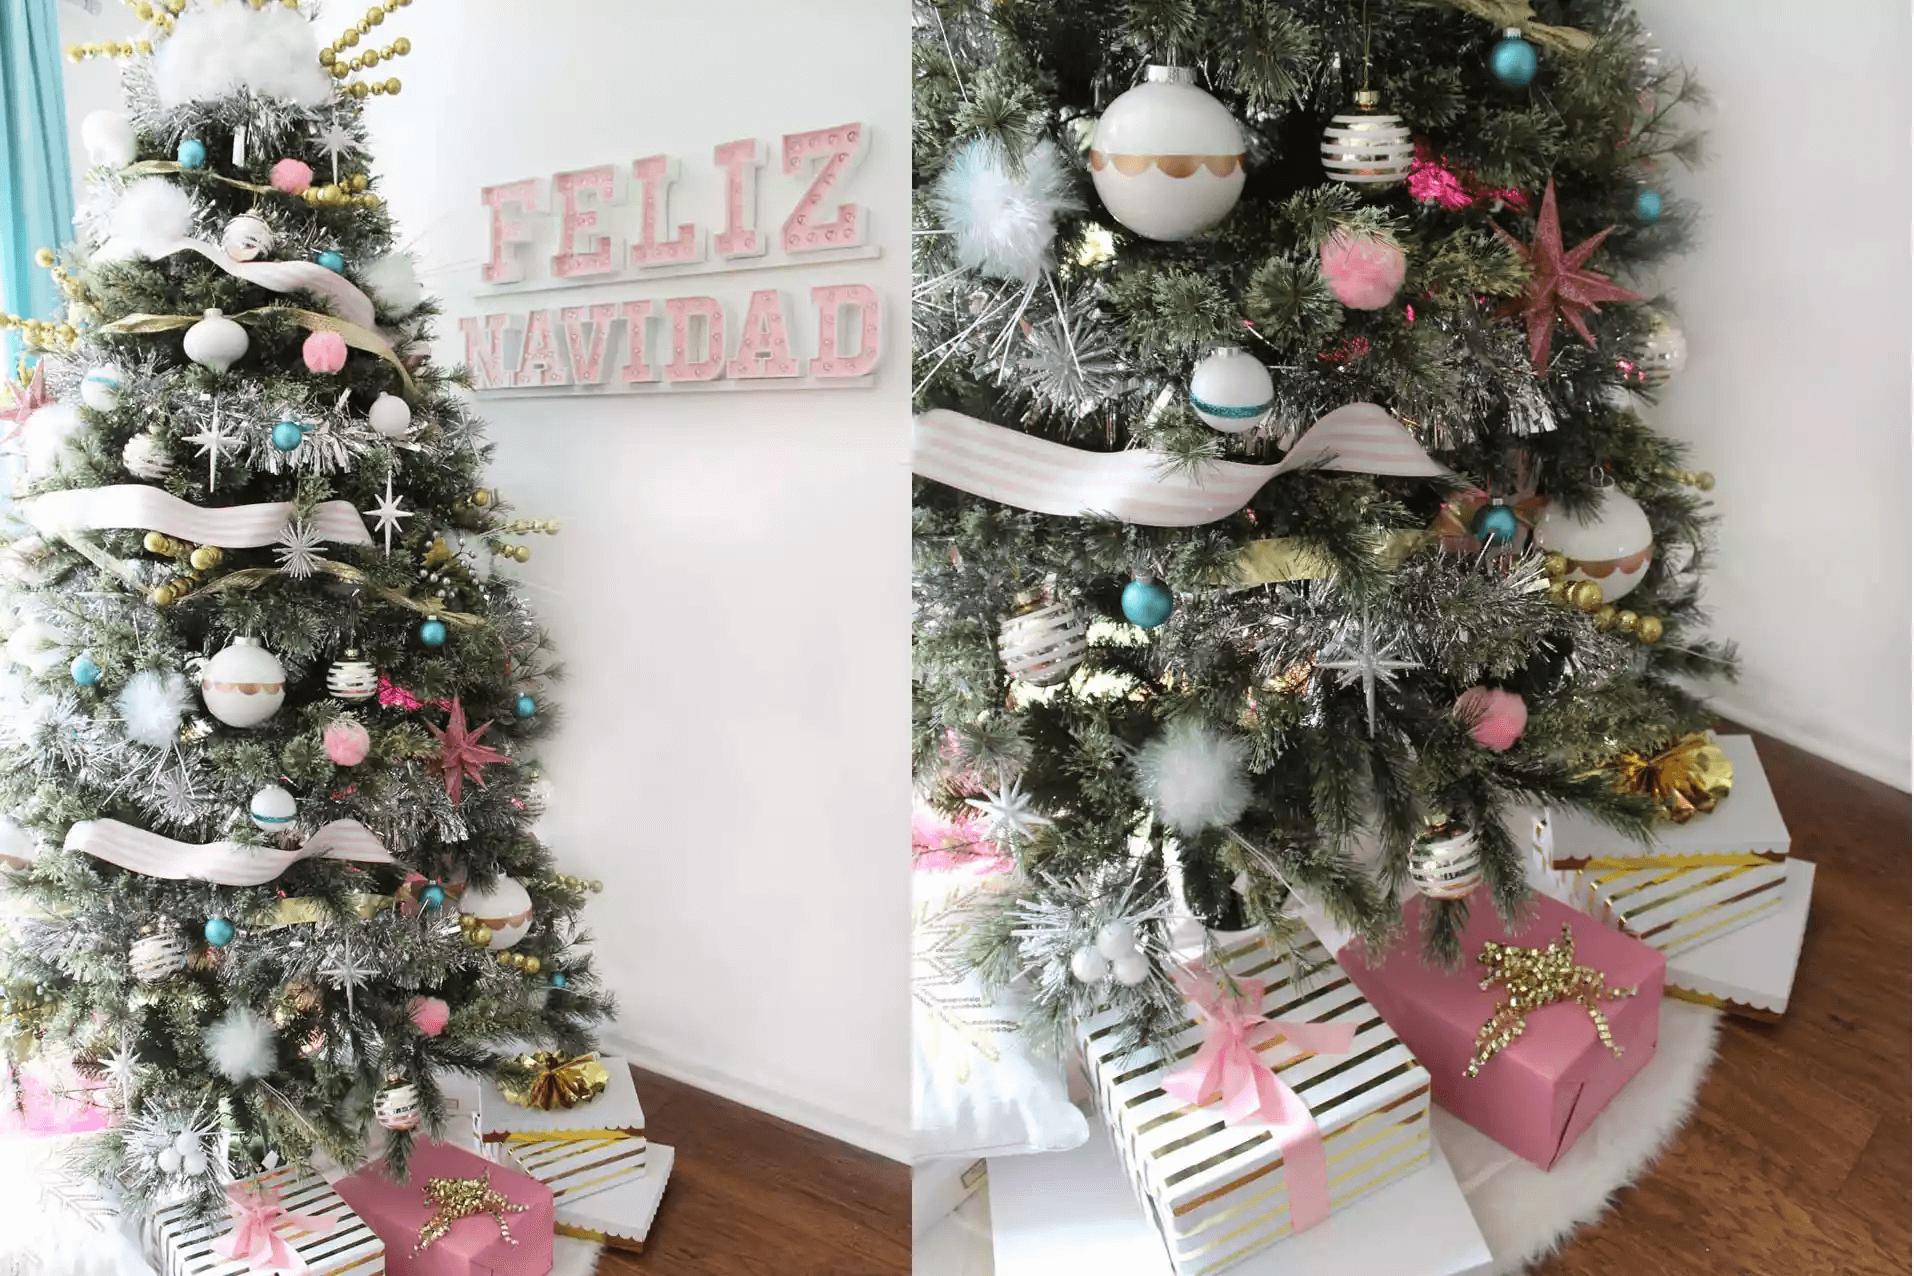 Arbre Pastel Feliz Navidad avec des cadeaux en dessous